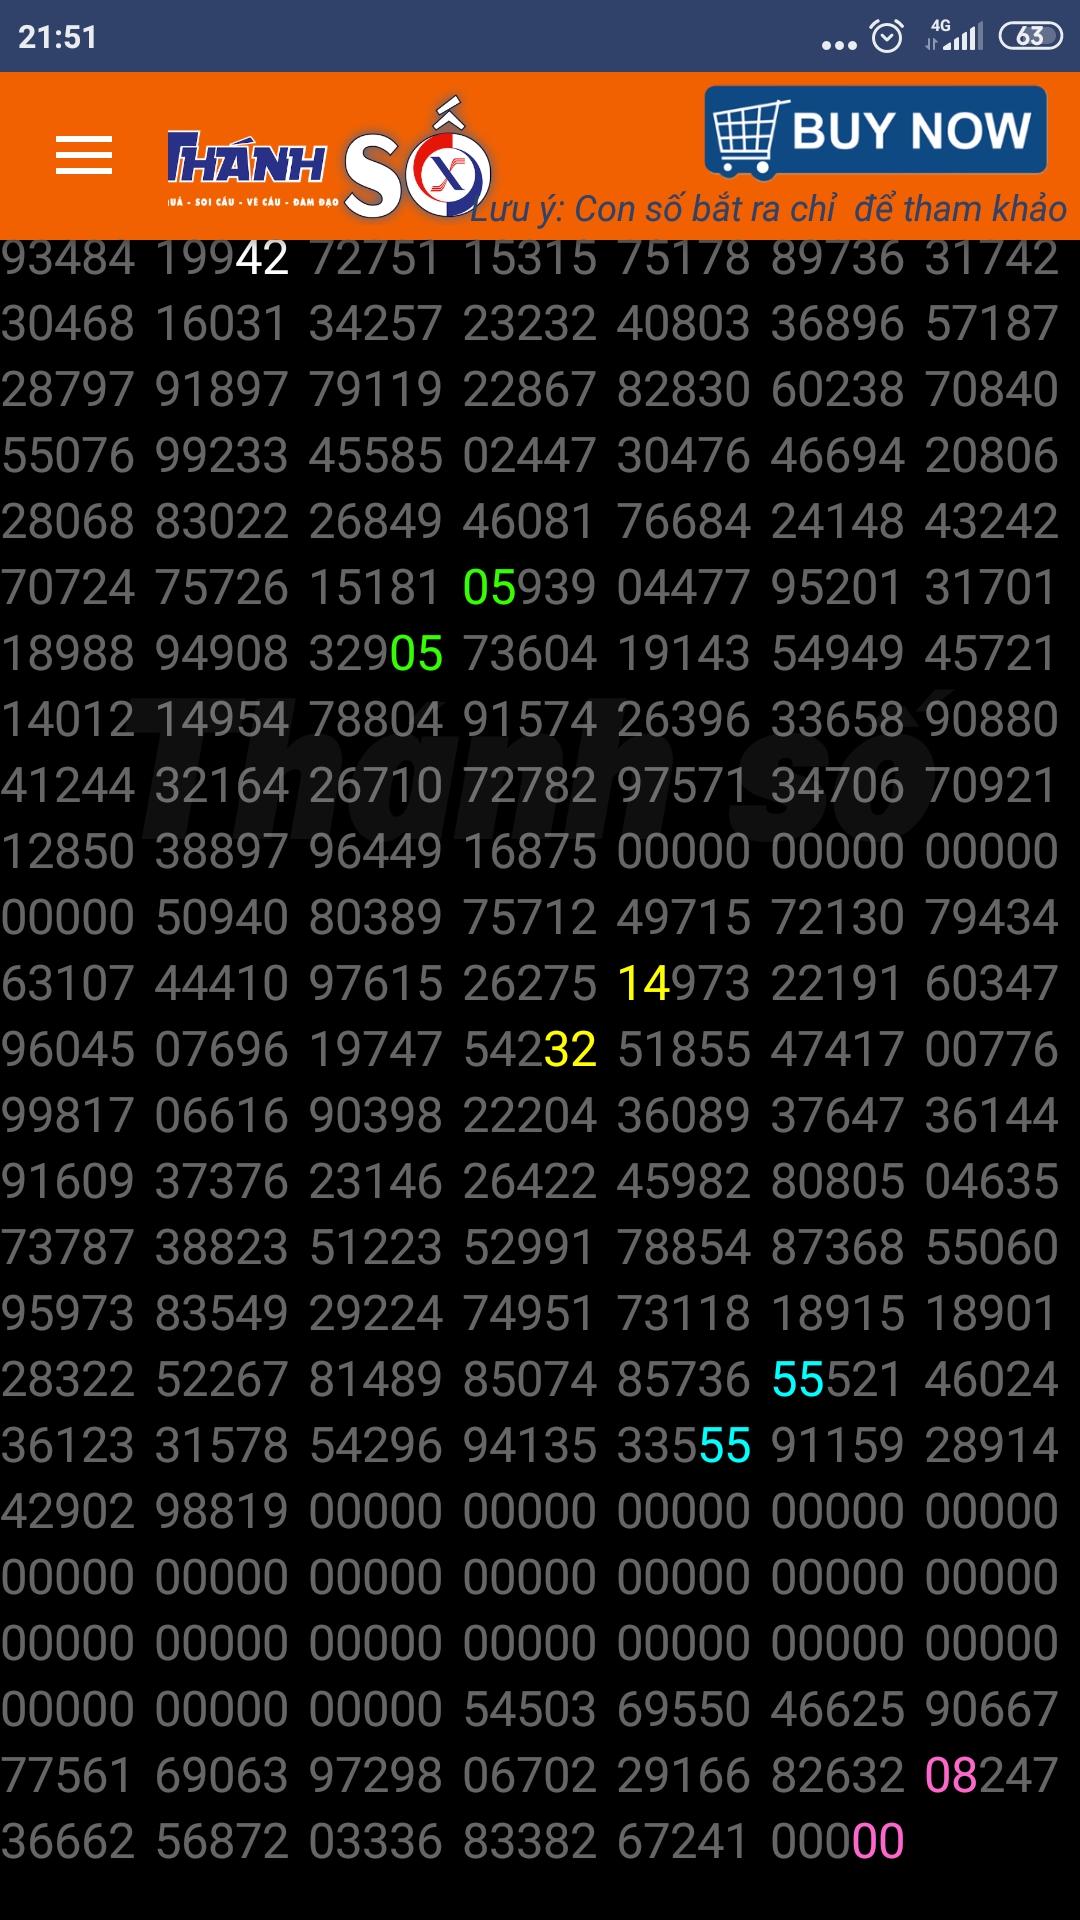 Screenshot_2020-05-08-21-51-42-202_com.thanhso.tool.jpg